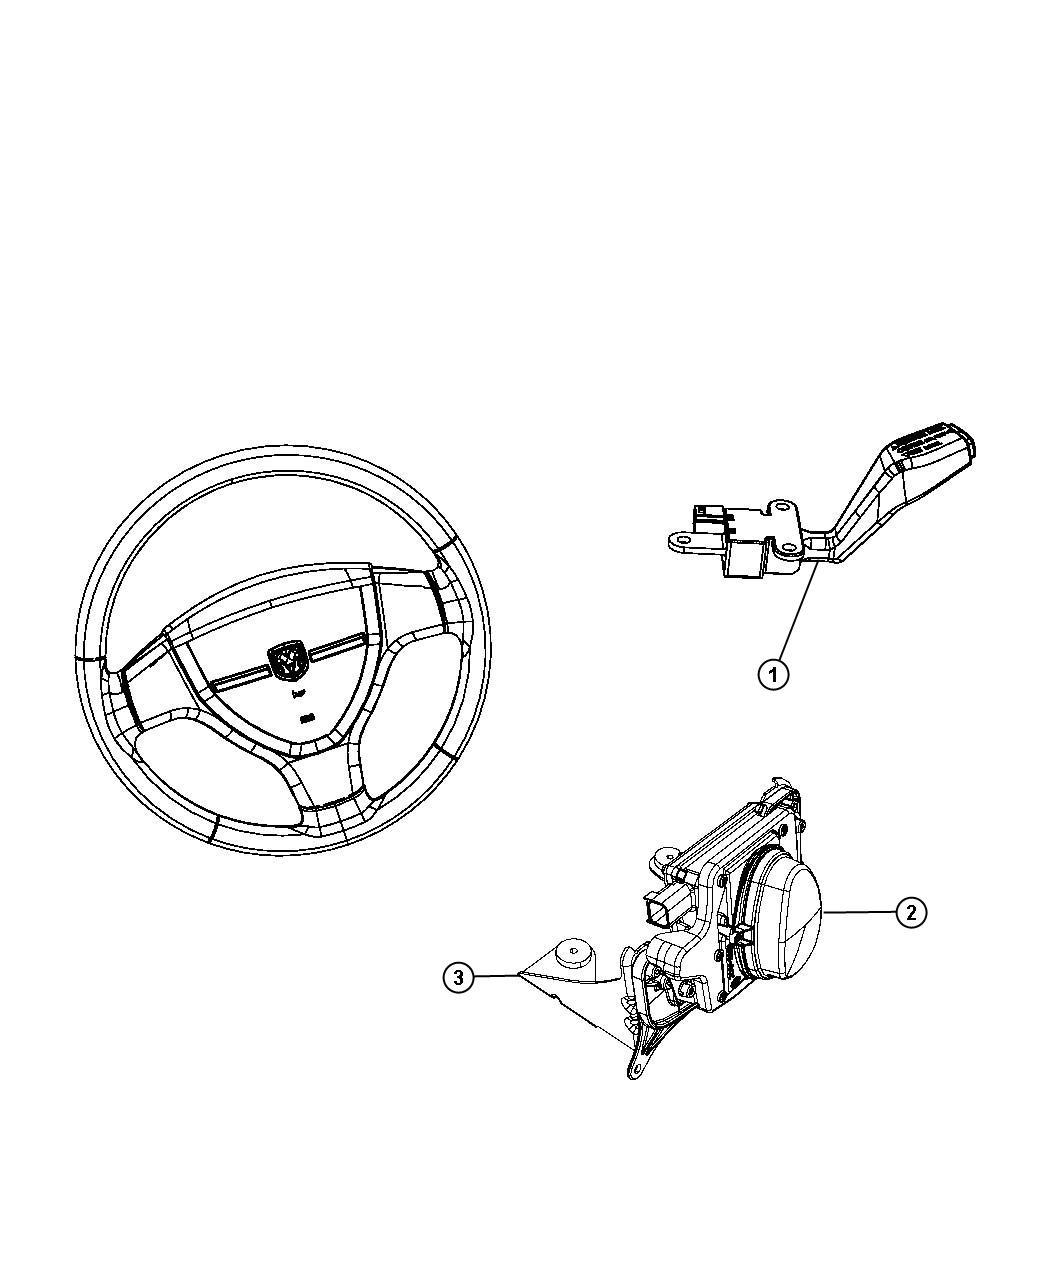 Chrysler 300 Used For Sensor And Bracket Adaptive